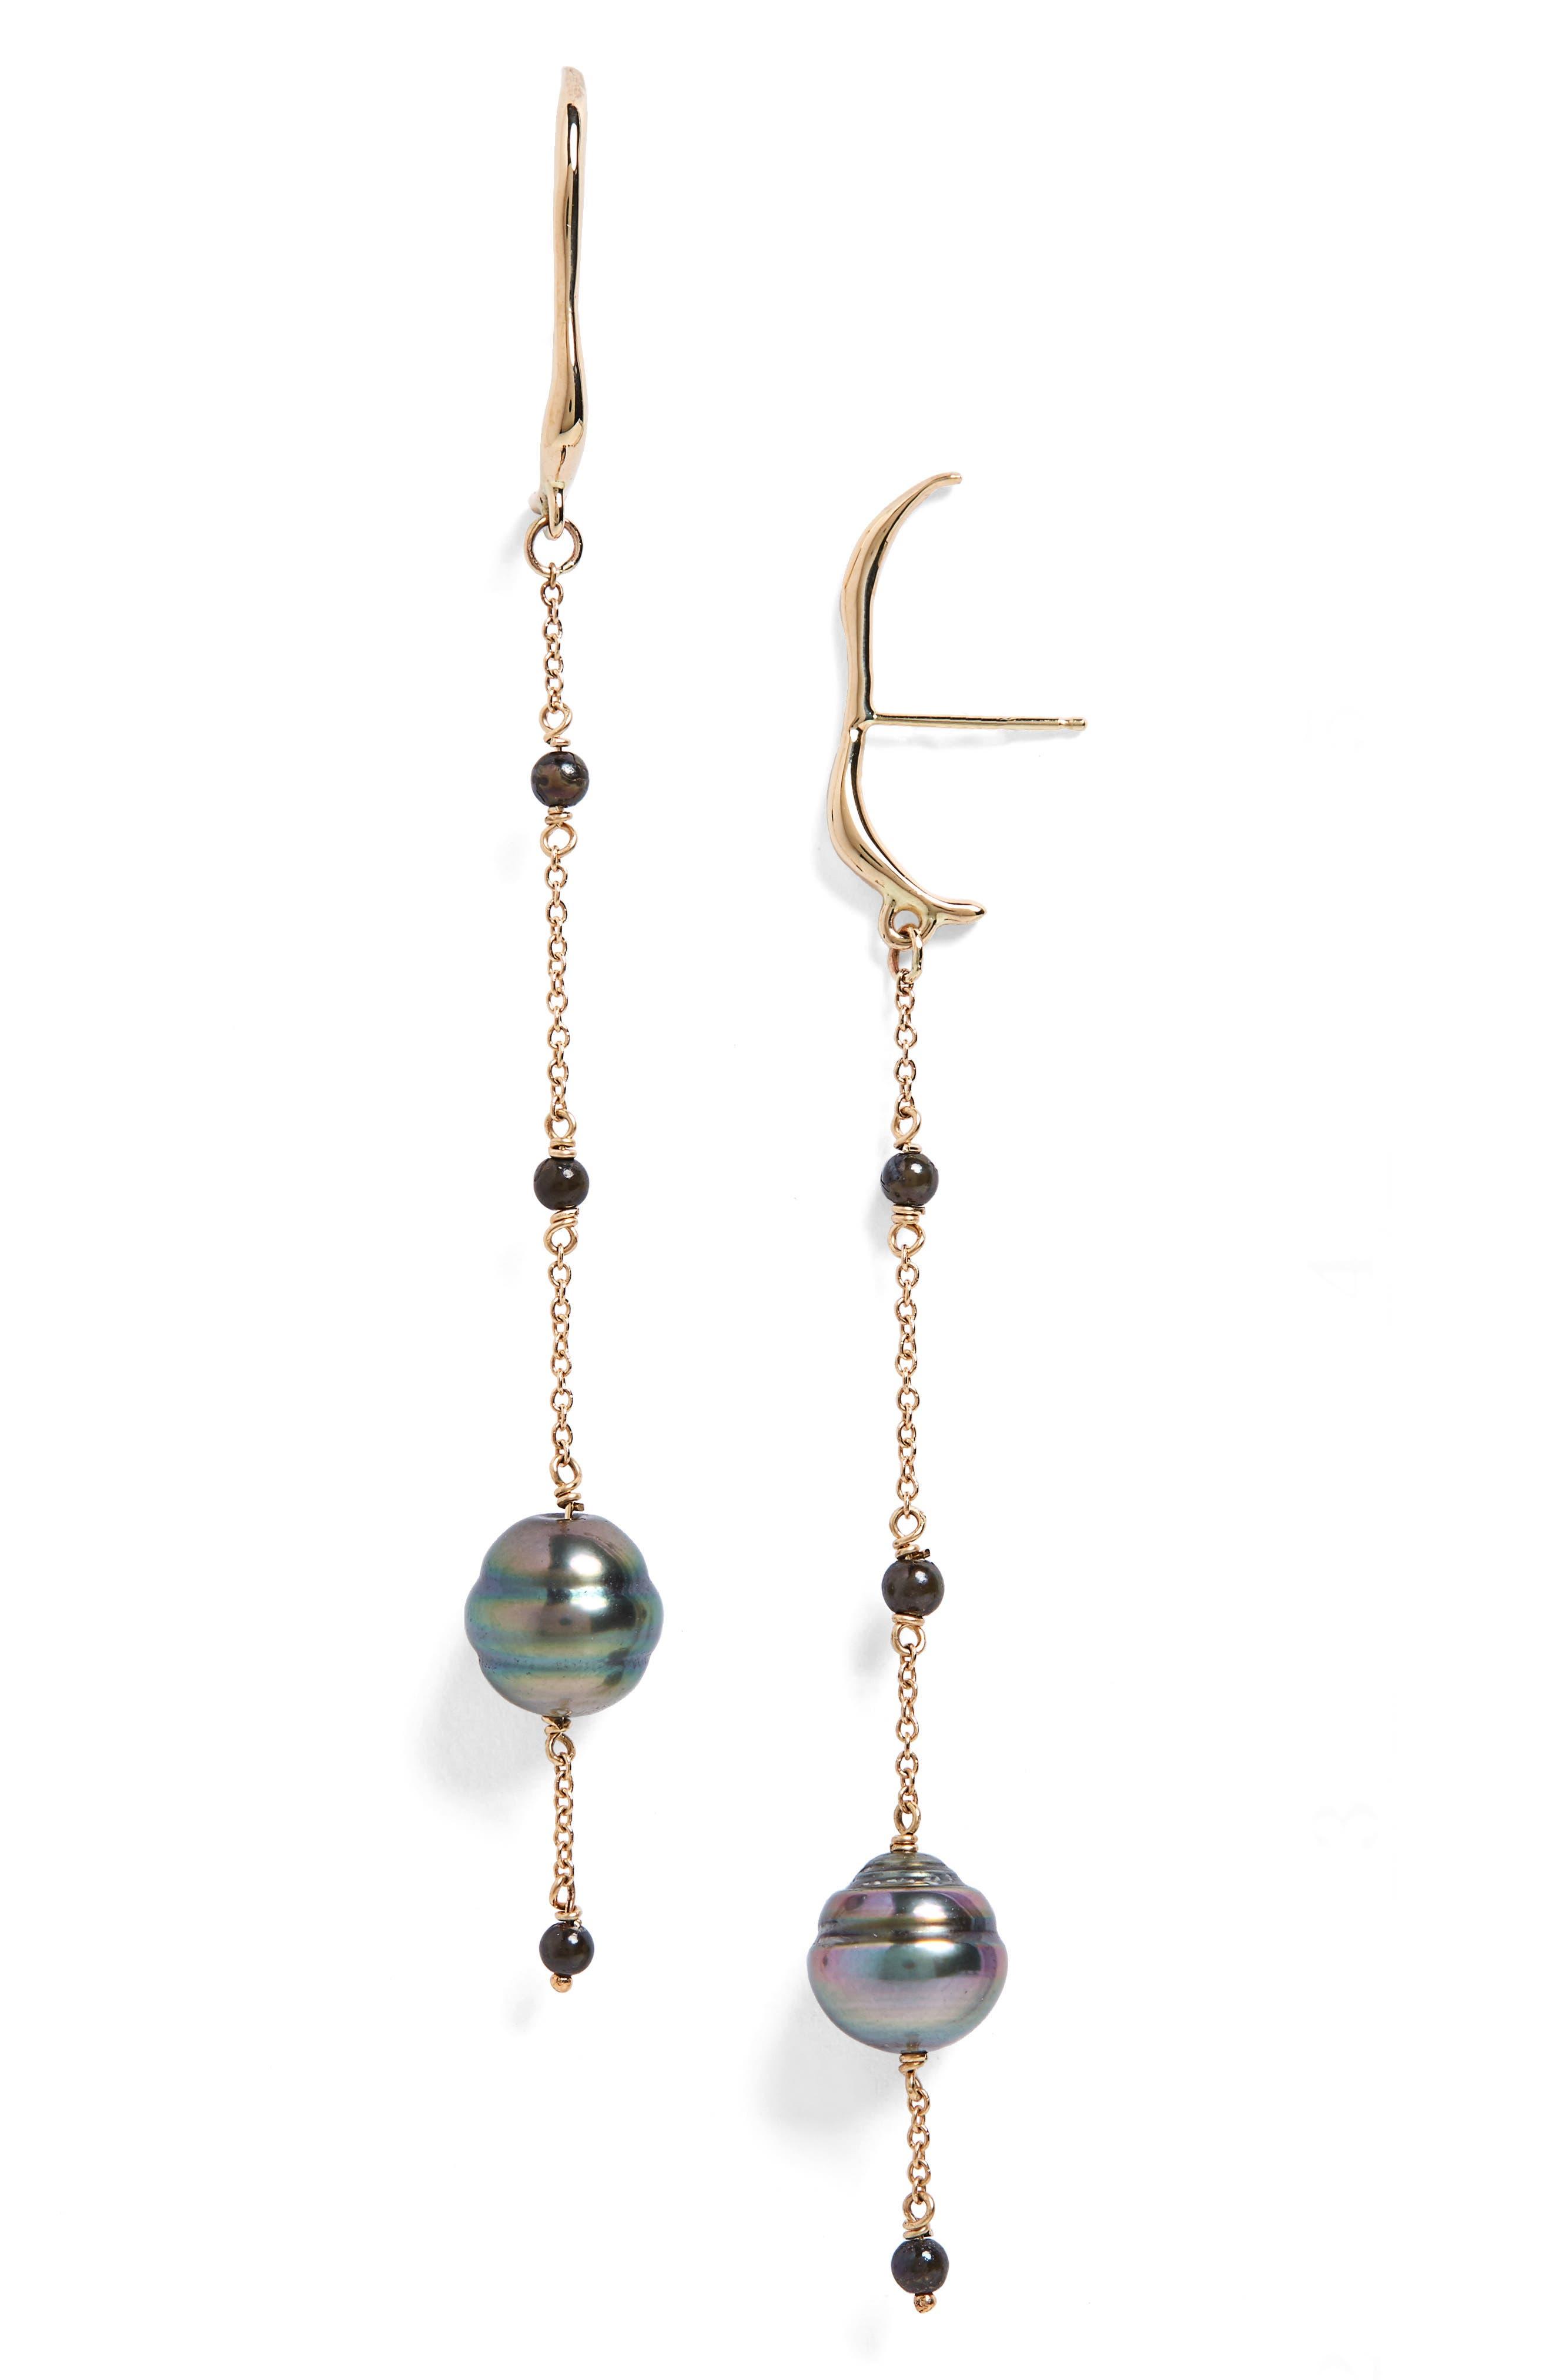 Aura Cultured Pearl Drop Earrings,                         Main,                         color, Gold/ Black Pearl